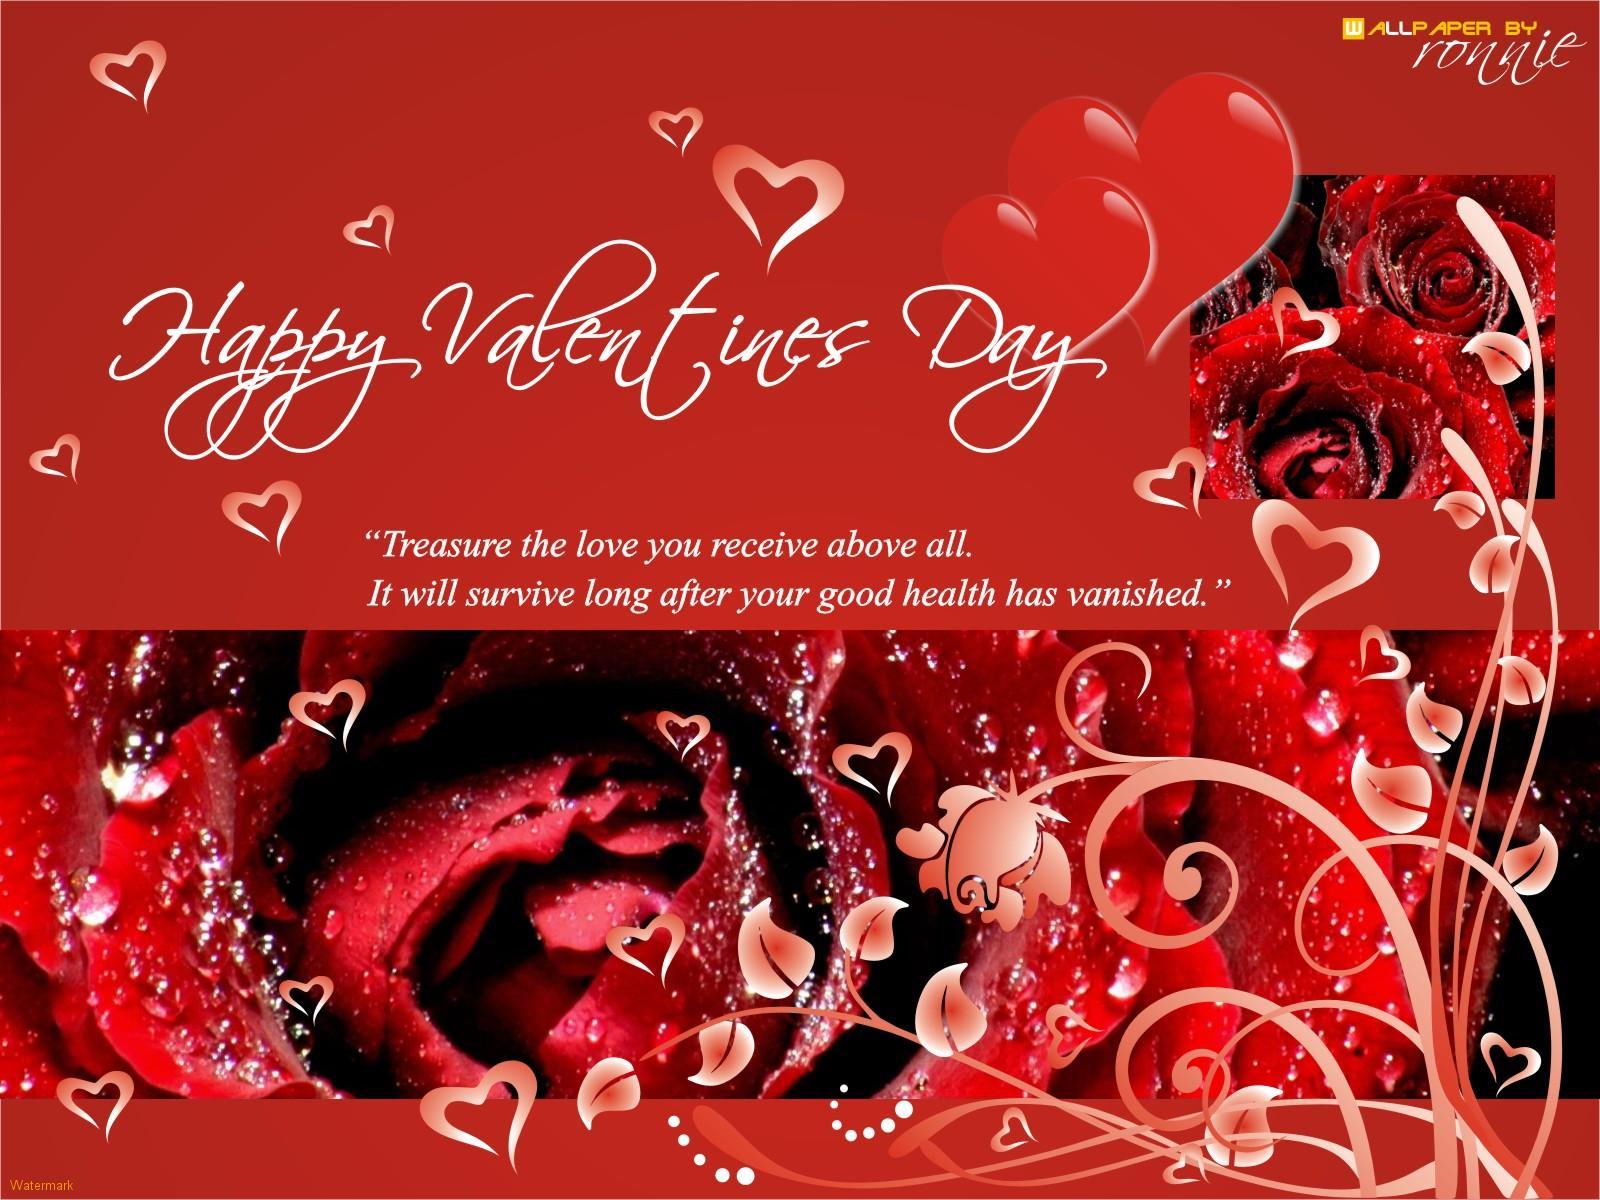 Valentines Day: Skd: Valentine Day SMS And Valentine Day Messages